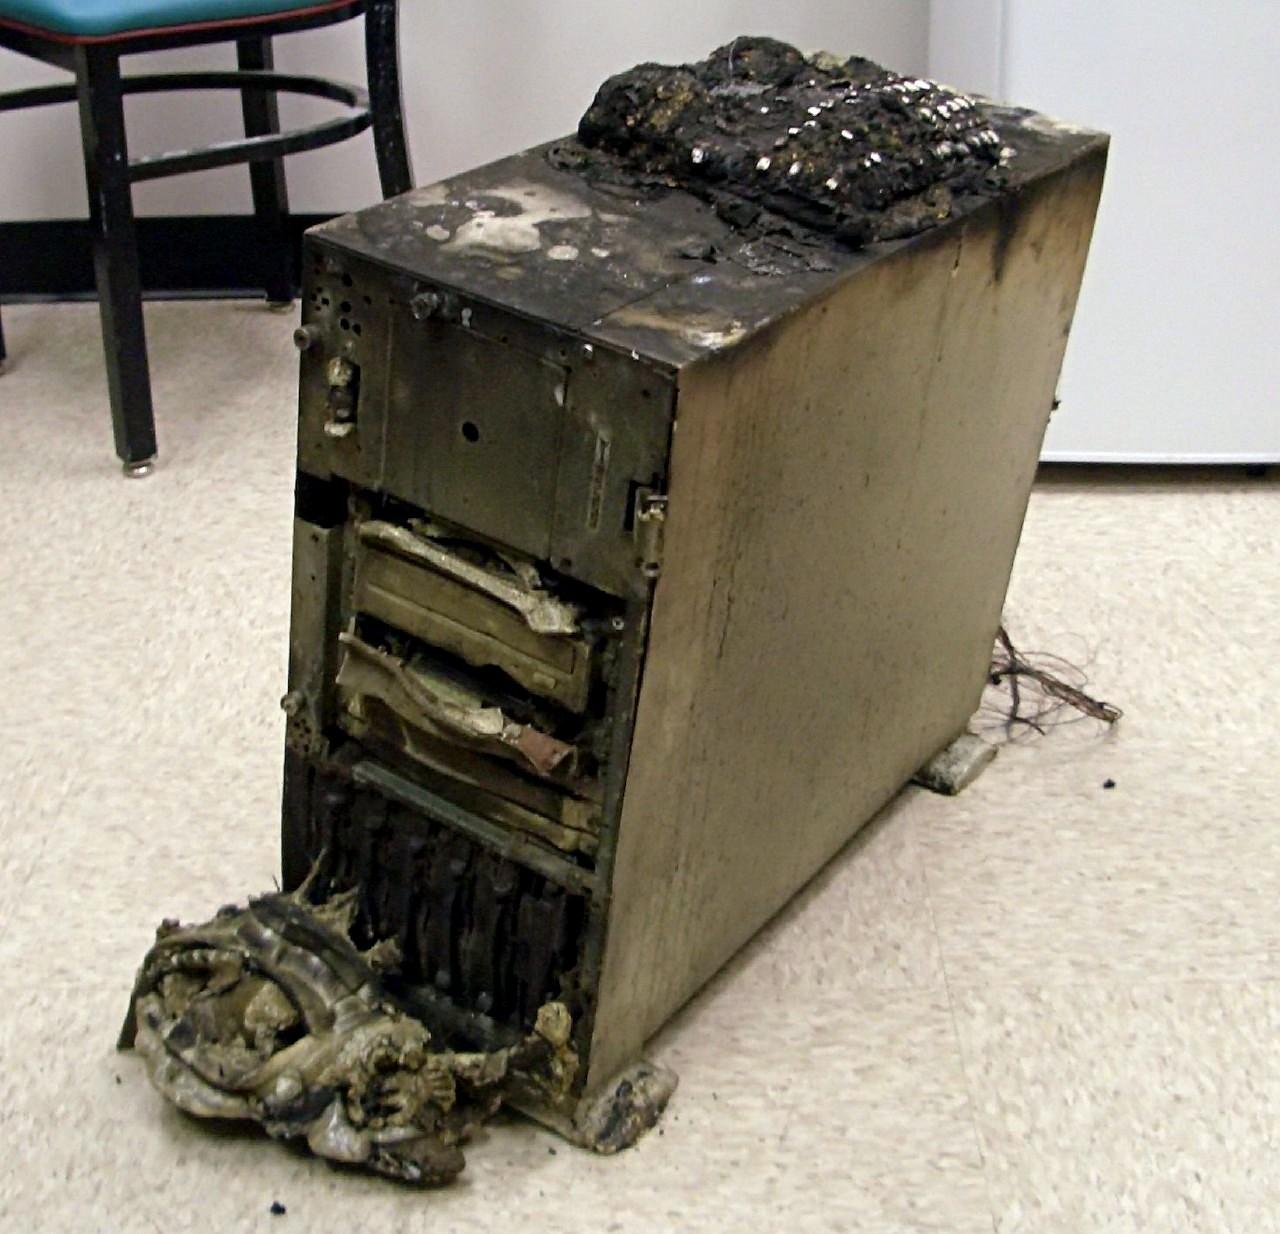 Dead PC